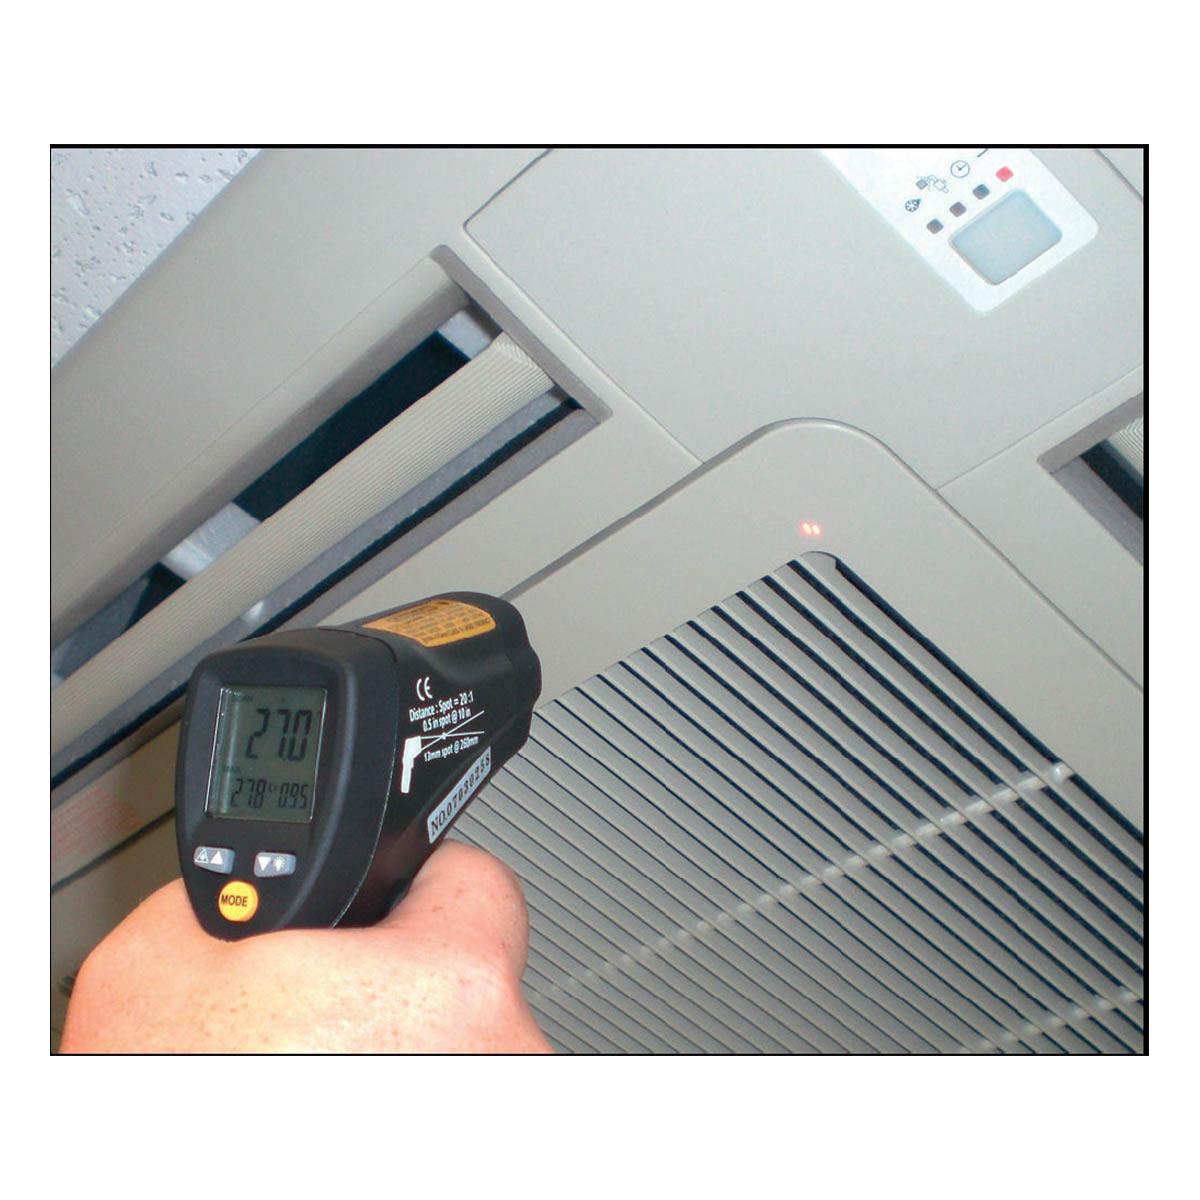 31-1124-infrarot-thermometer-scantemp-485-anwendung7-1200x1200px.jpg